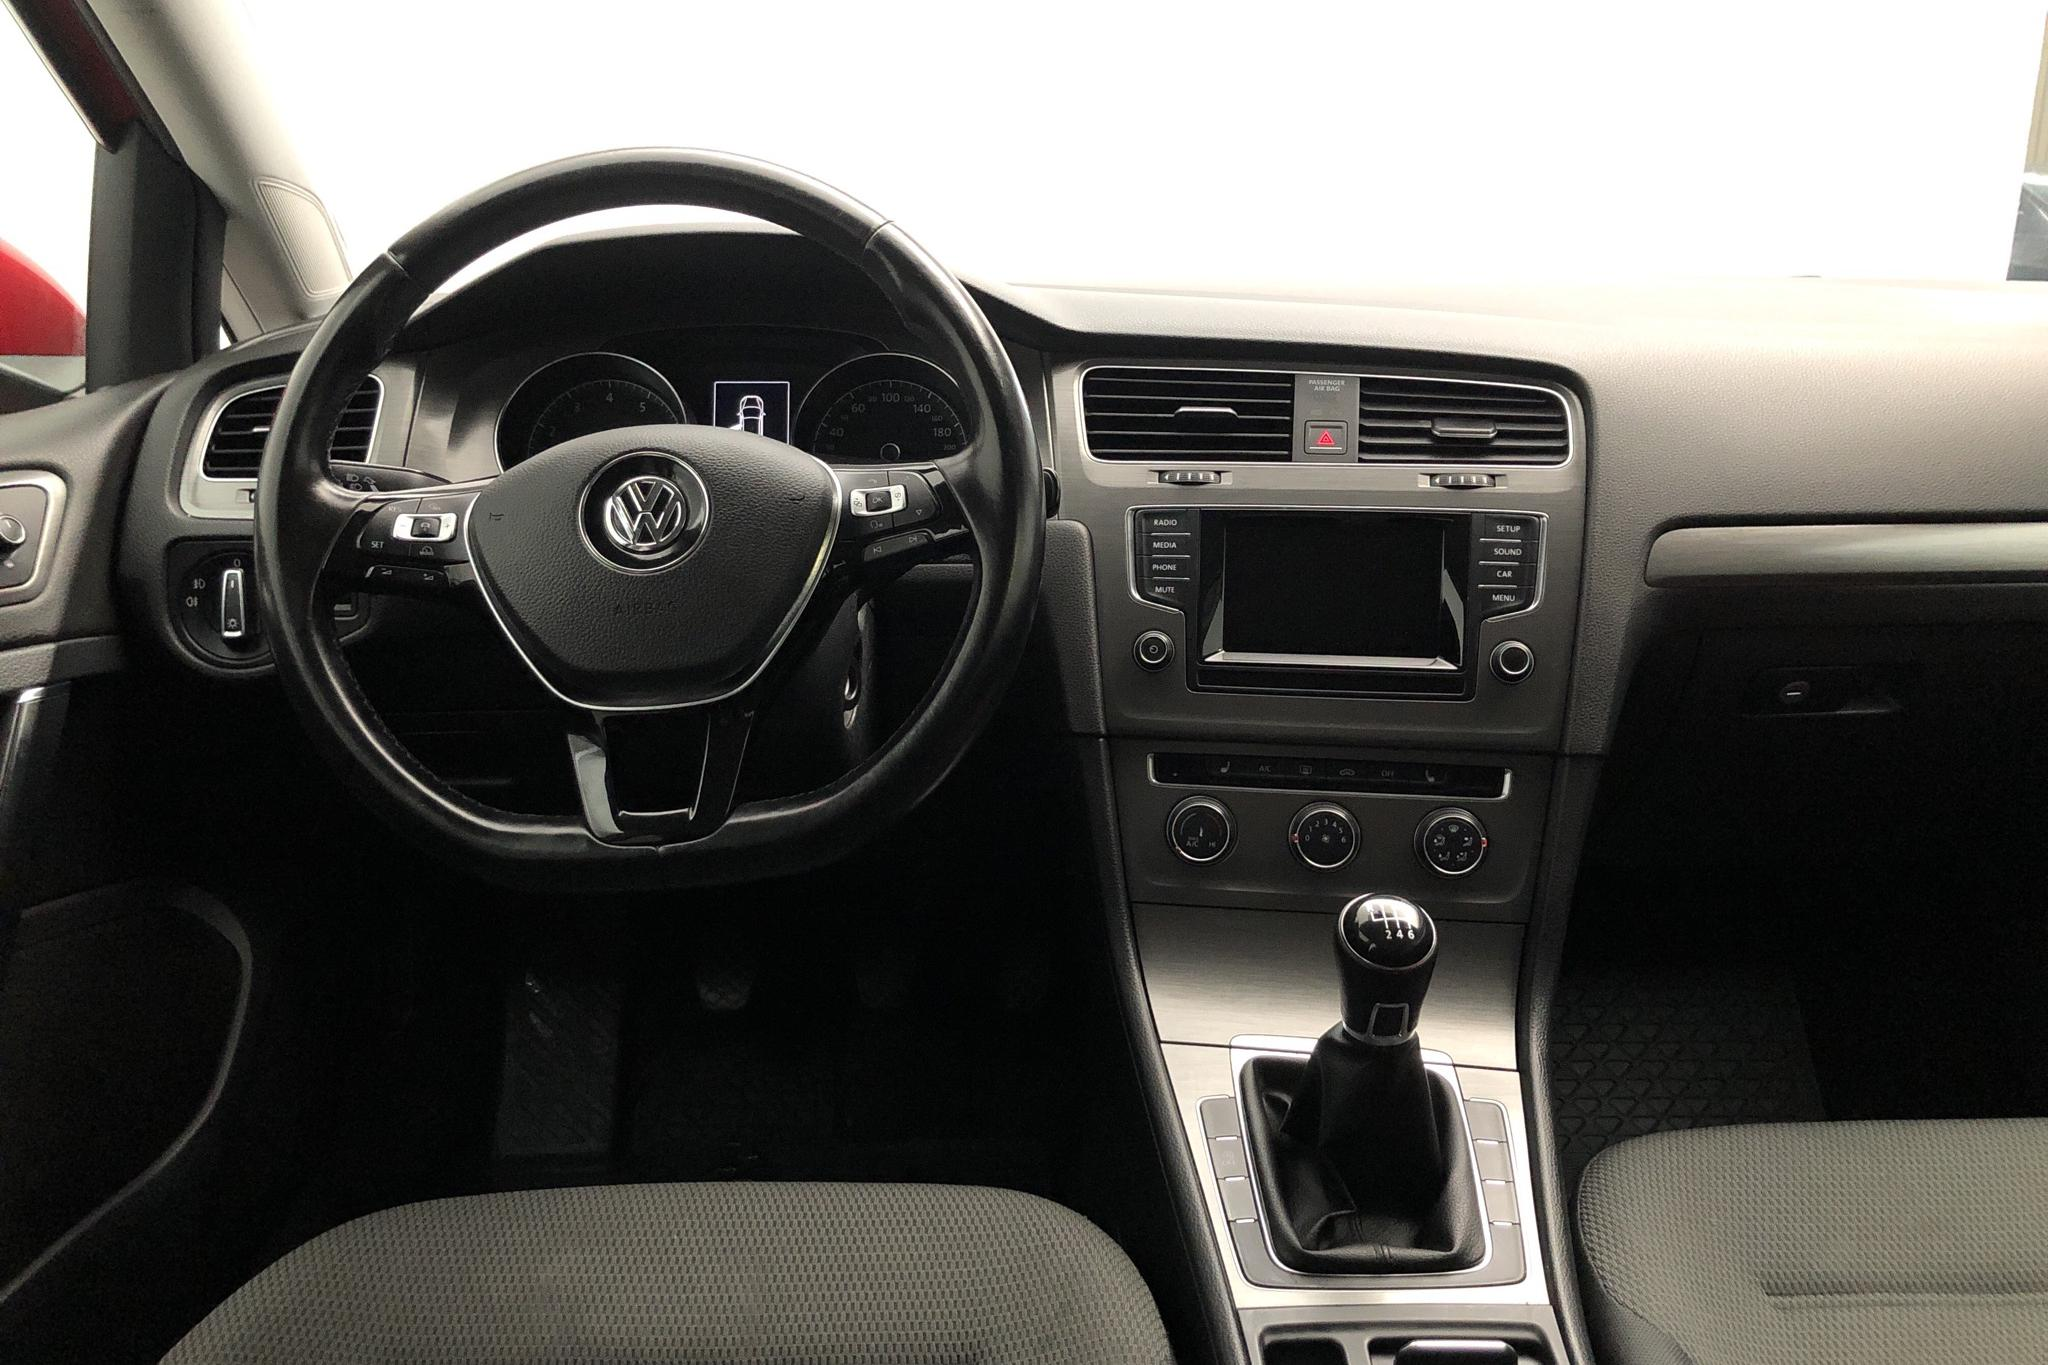 VW Golf VII 1.4 TSI Multifuel 5dr (122hk) - 204 220 km - Manual - red - 2014